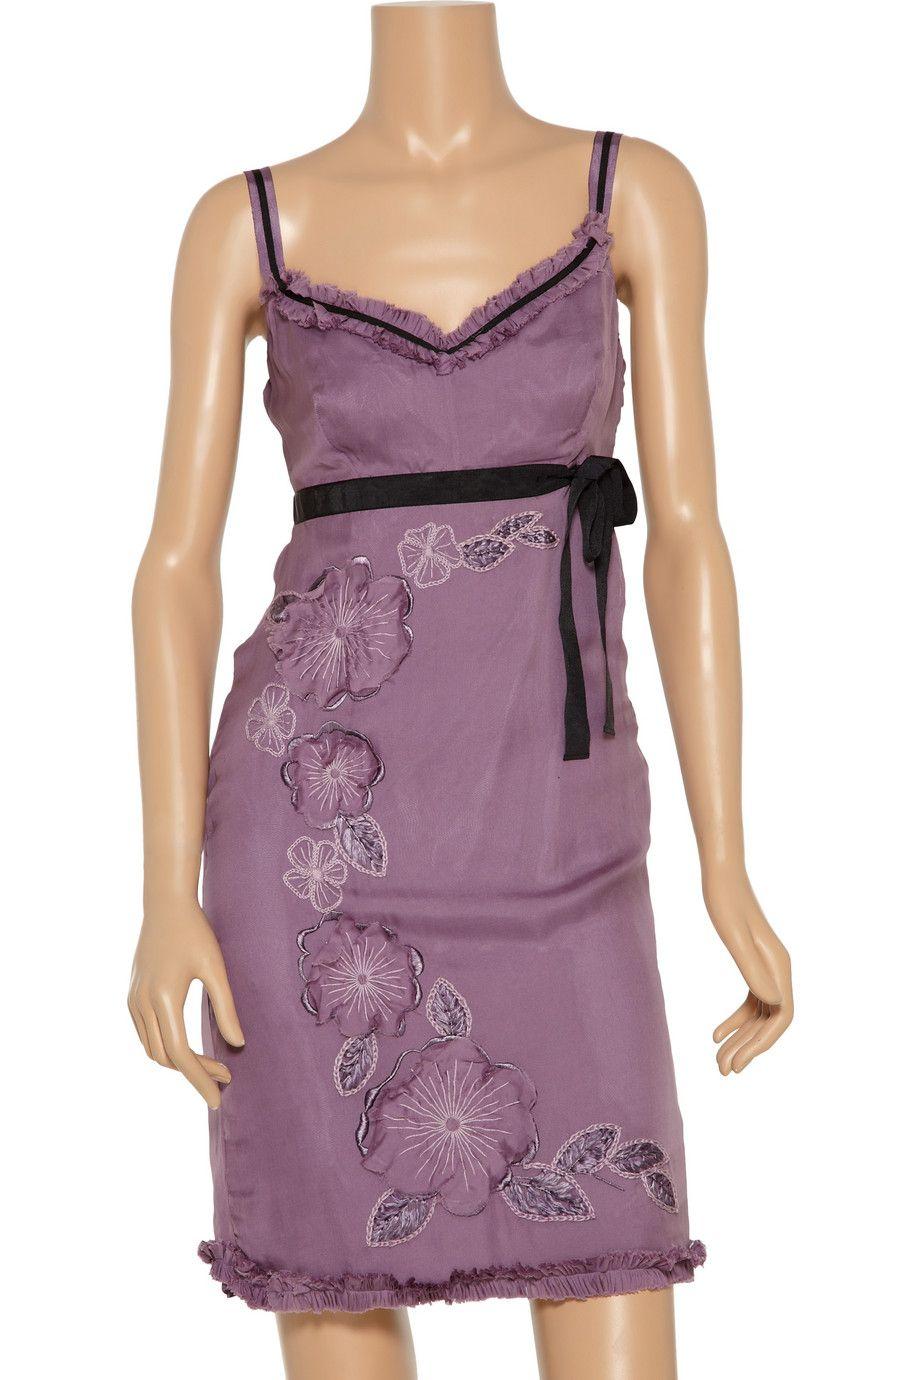 huge discount 29ea3 72c27 Philosophy di Alberta Ferretti Embellished silk dress 84 ...